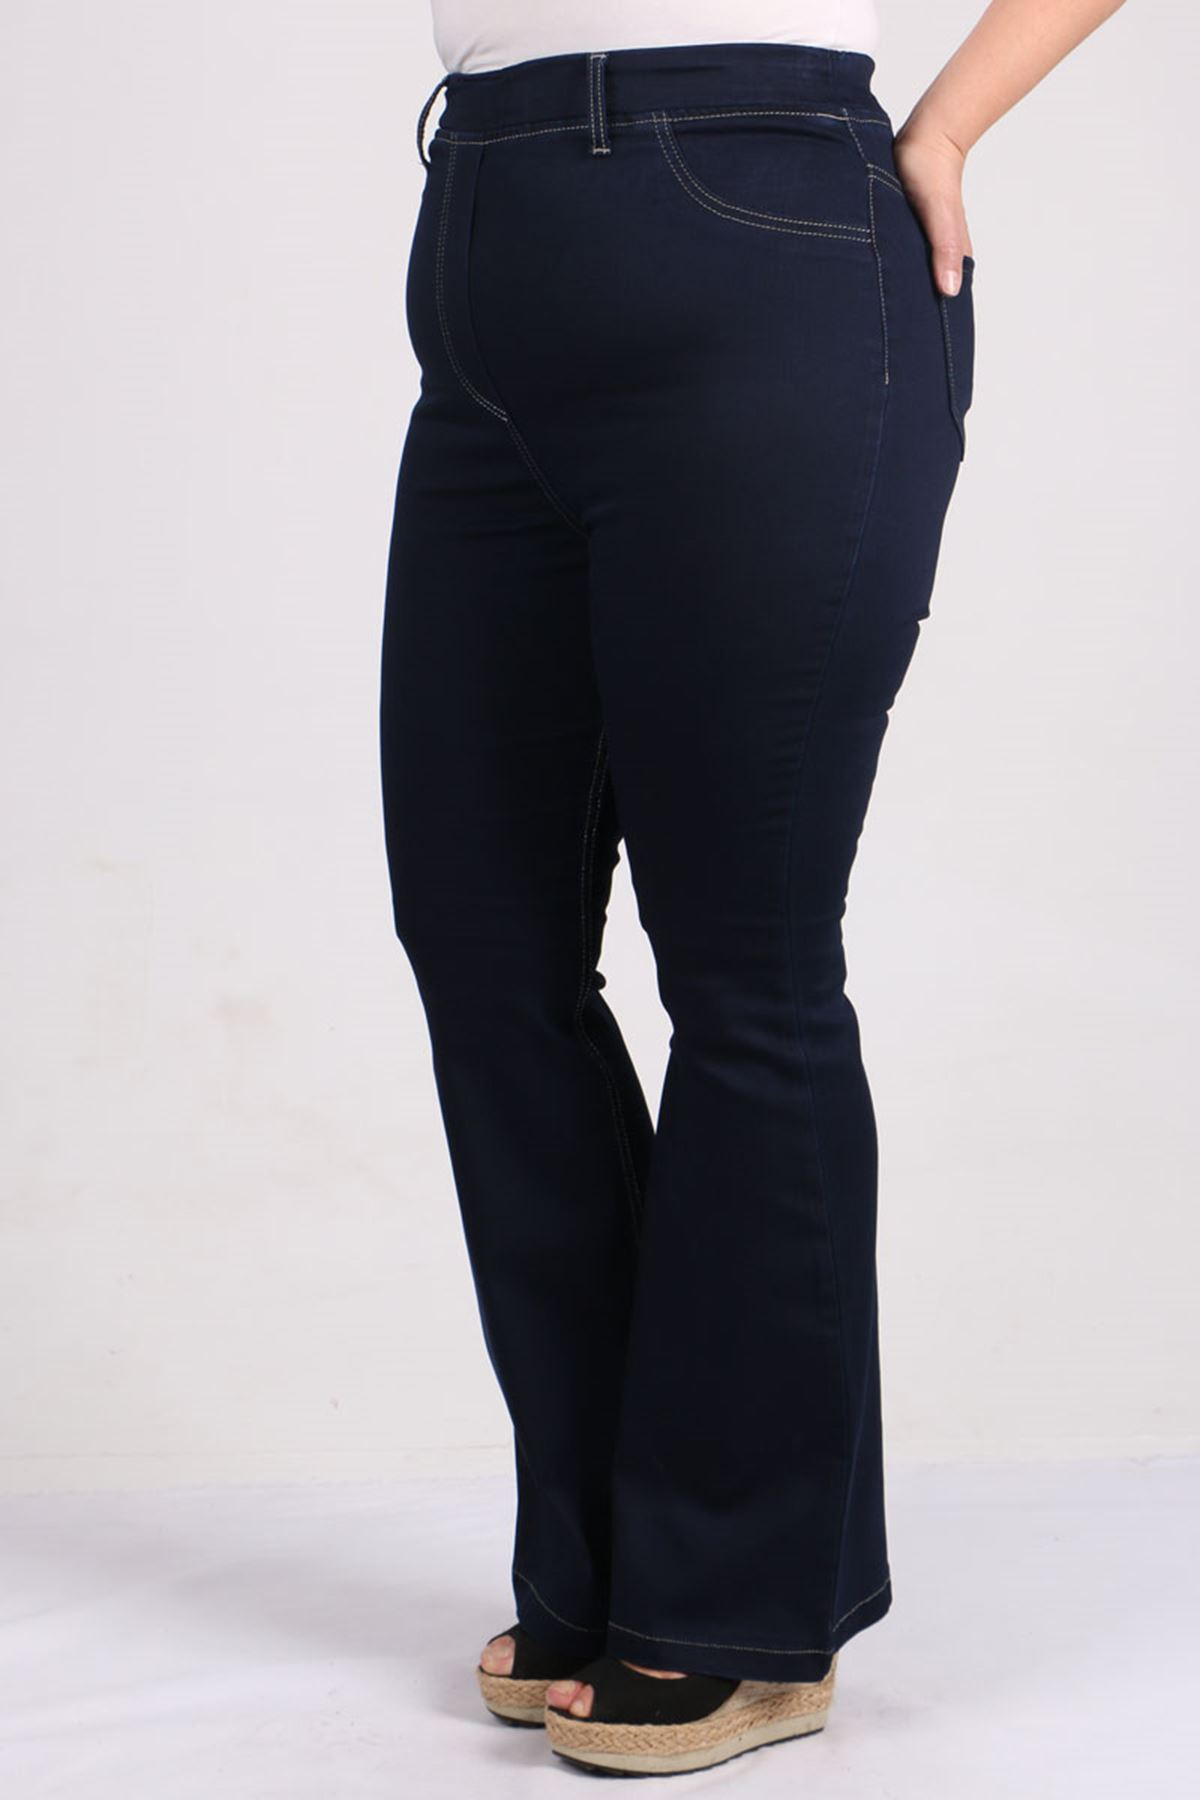 9137 Büyük Beden Beli Lastikli İspanyol Paça Kot Pantalon-Koyu Lacivert